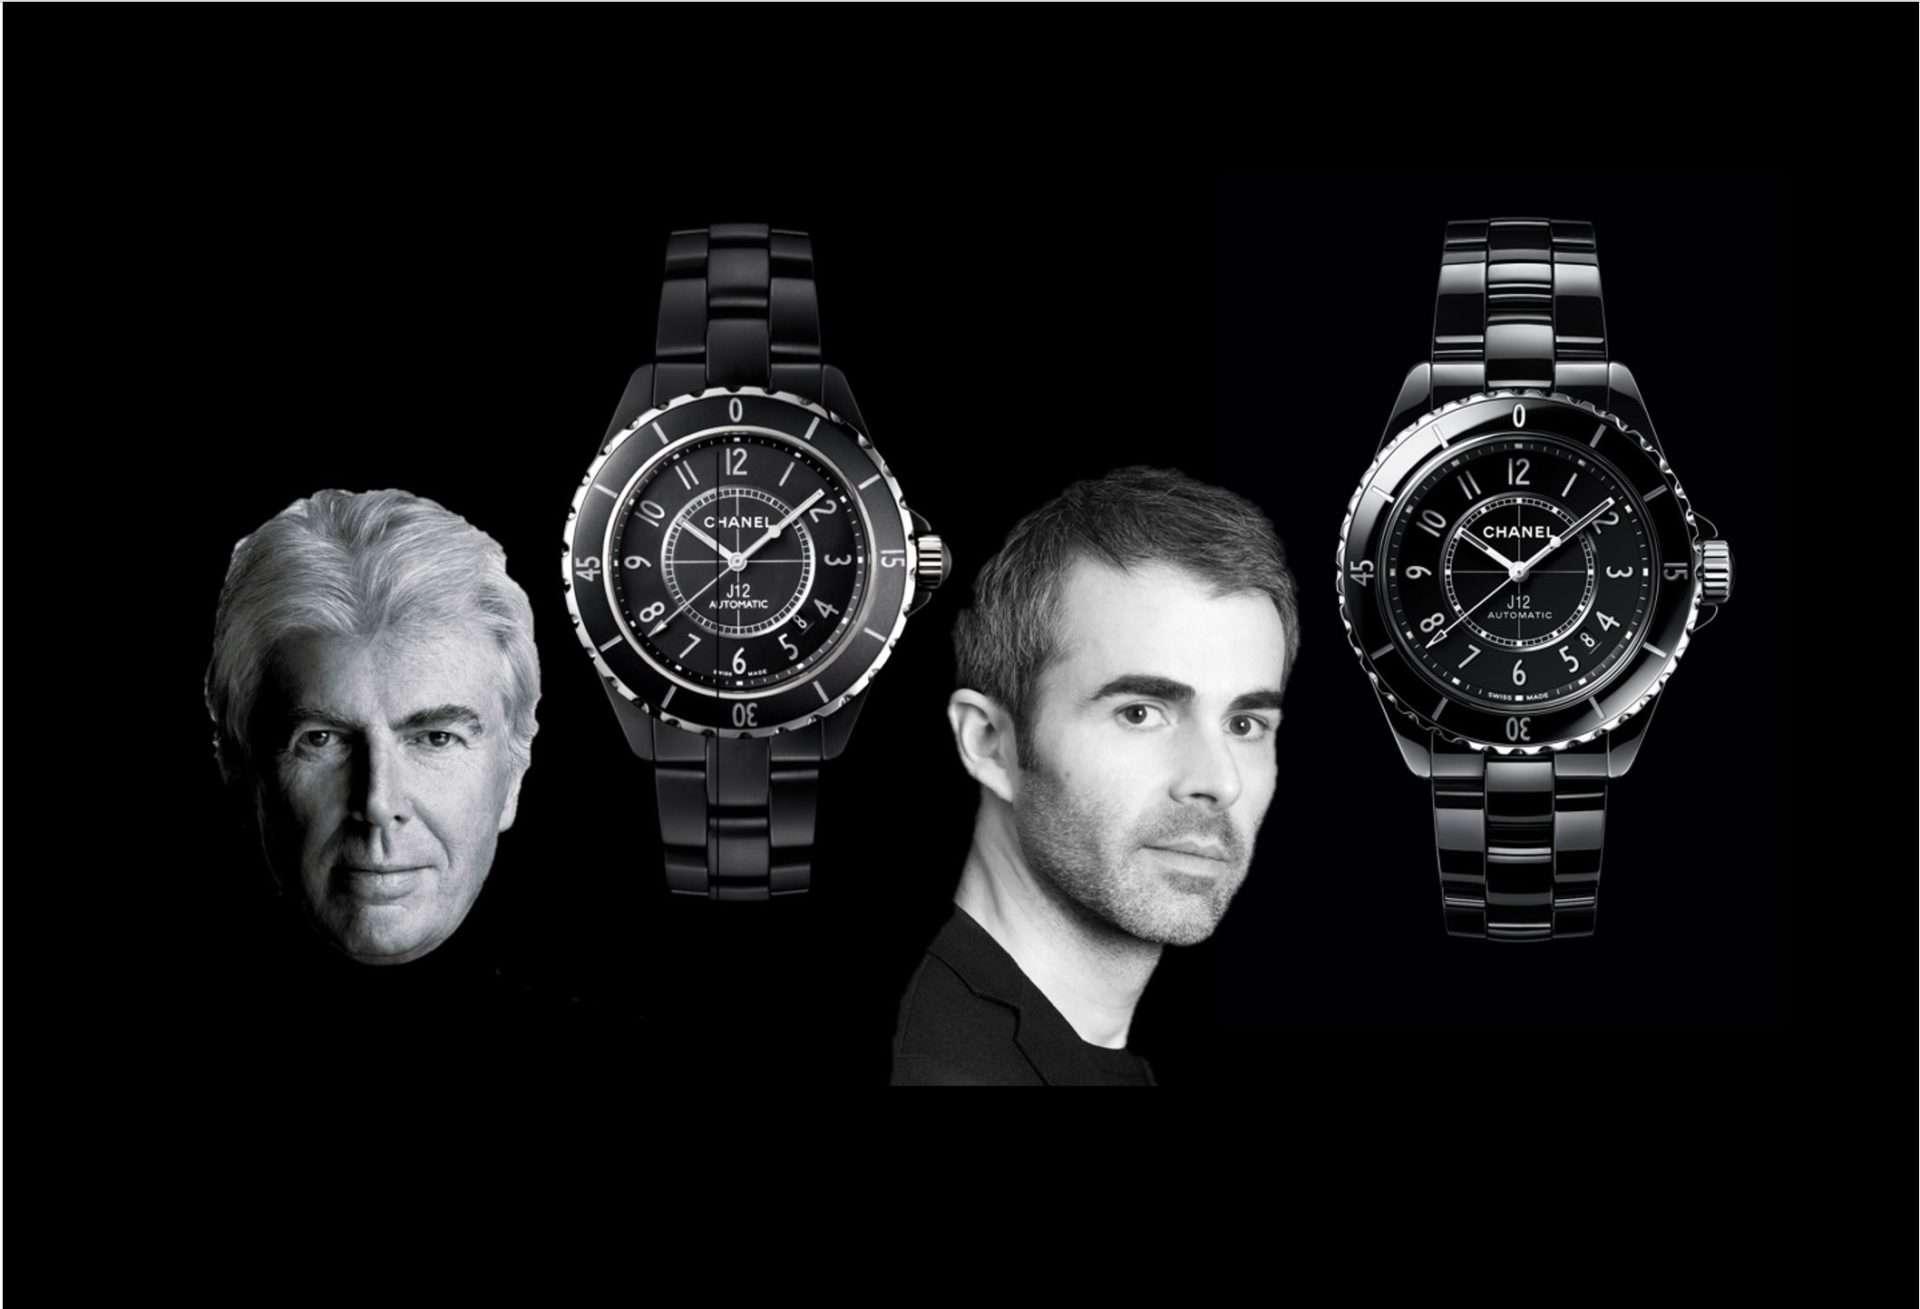 Chanel J12 Keramik-Uhr mit Automatikkaliber 12.2 Chanel J12 Keramik-Uhr: Evolution statt Revolution